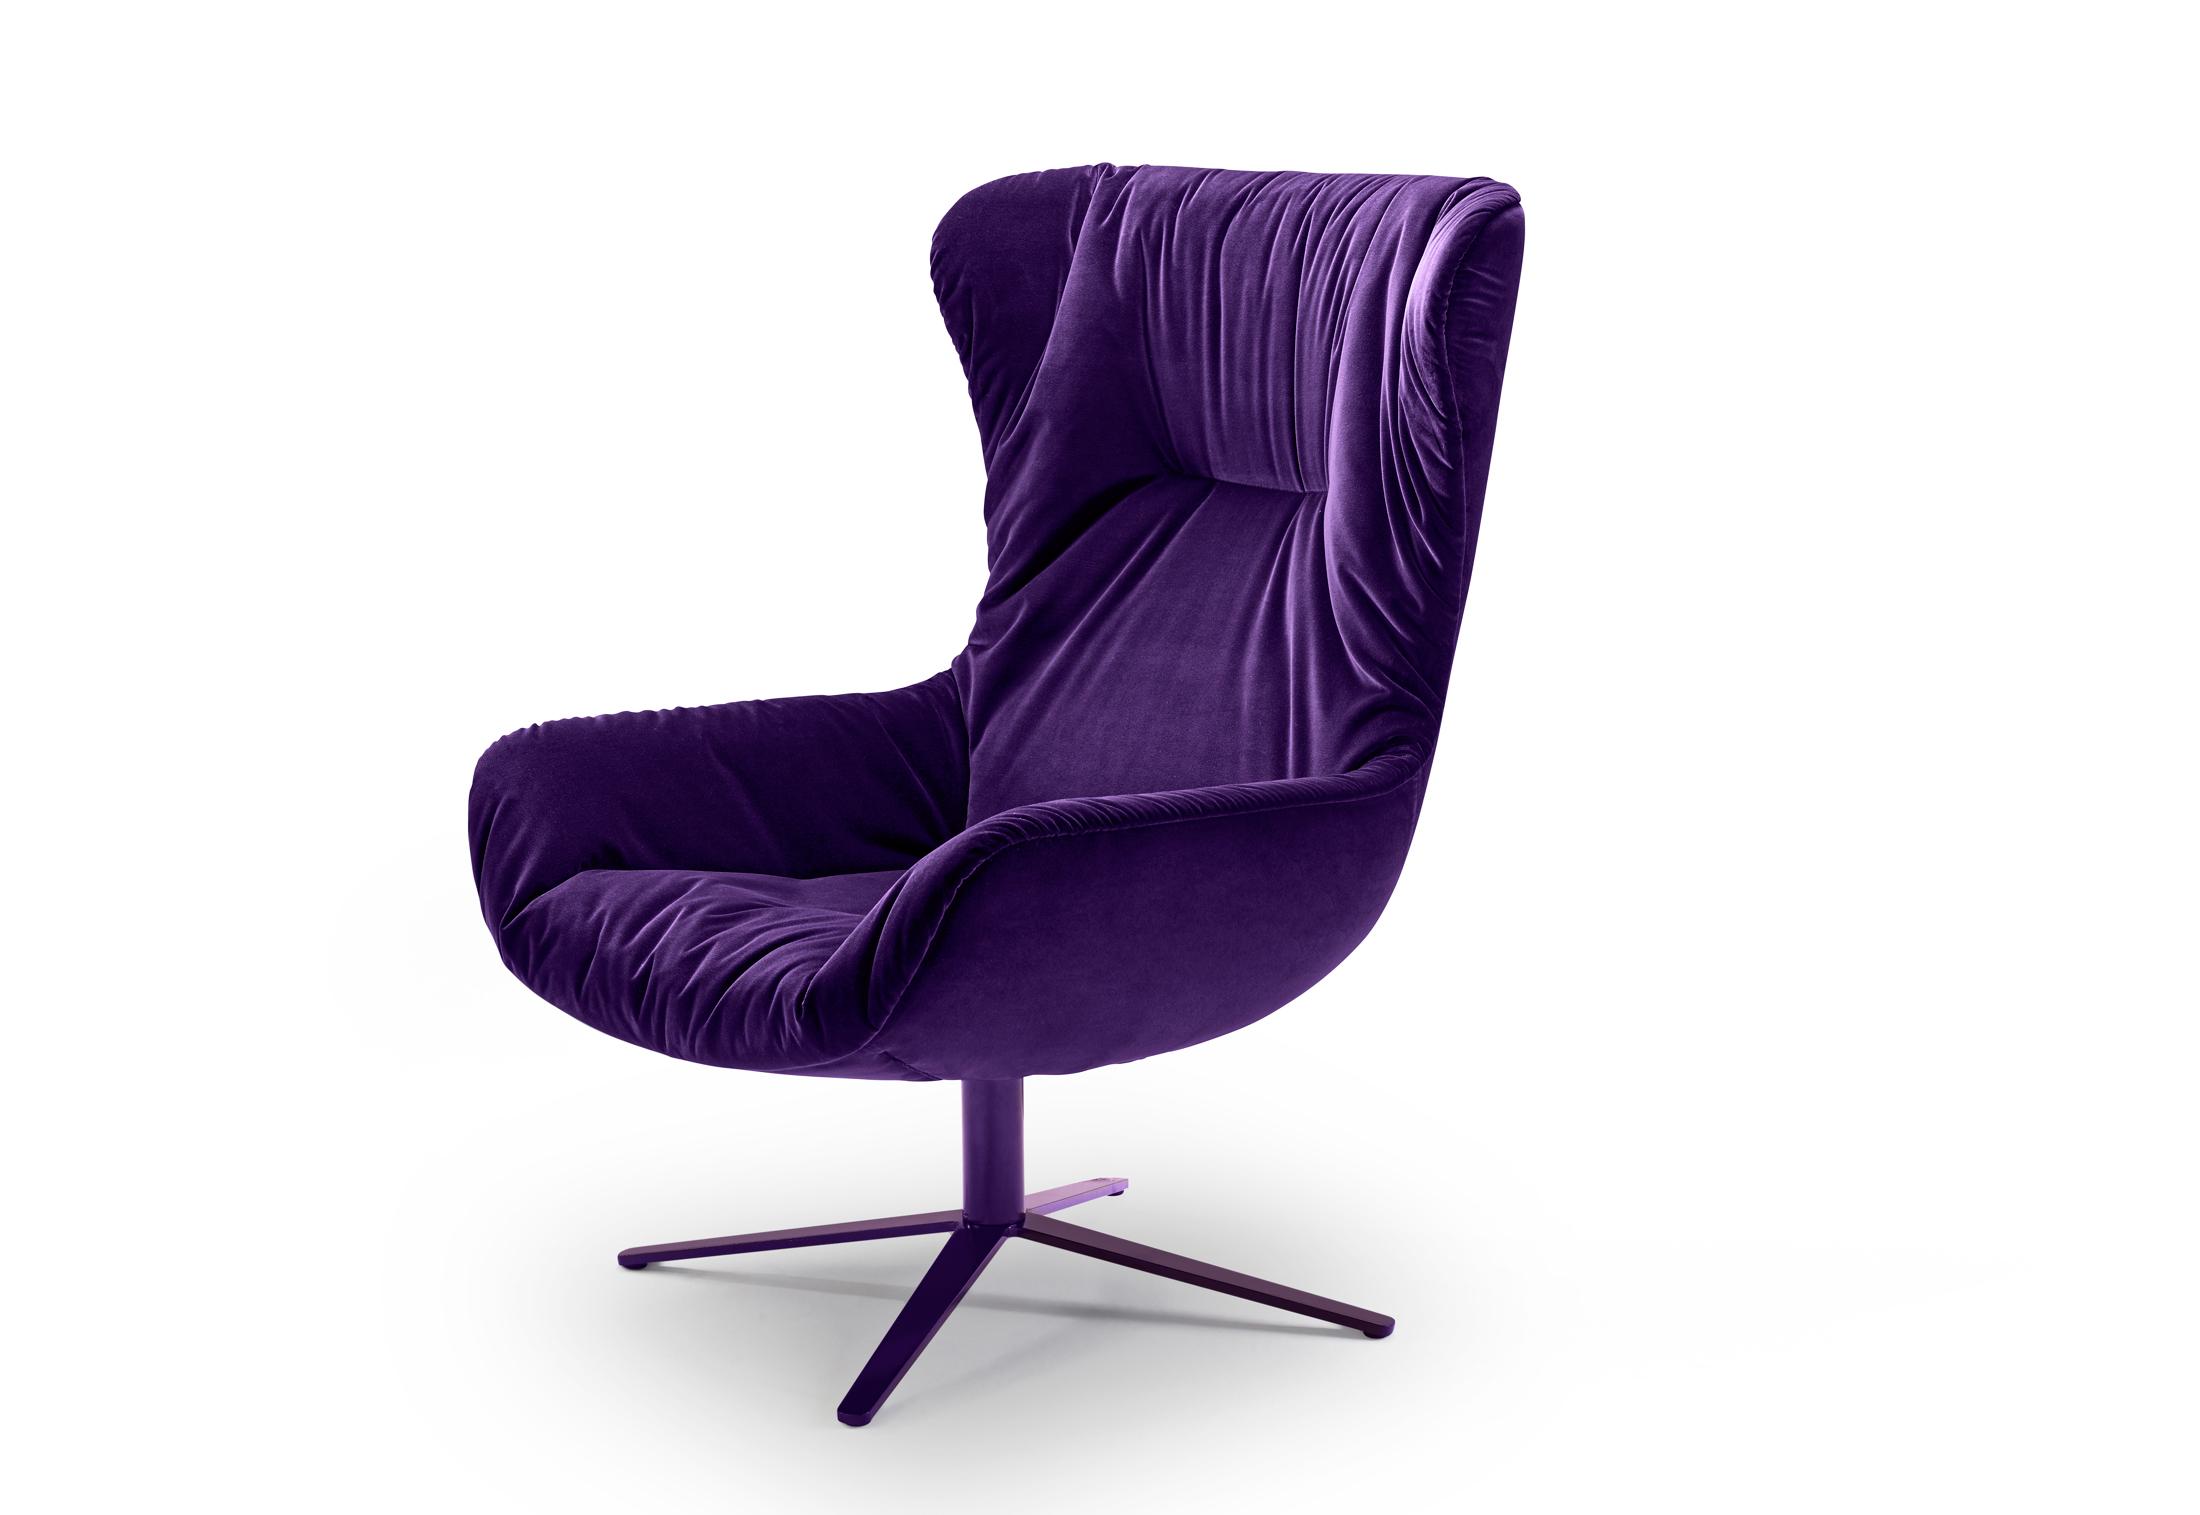 Leya wingback chair with x base frame by Freifrau